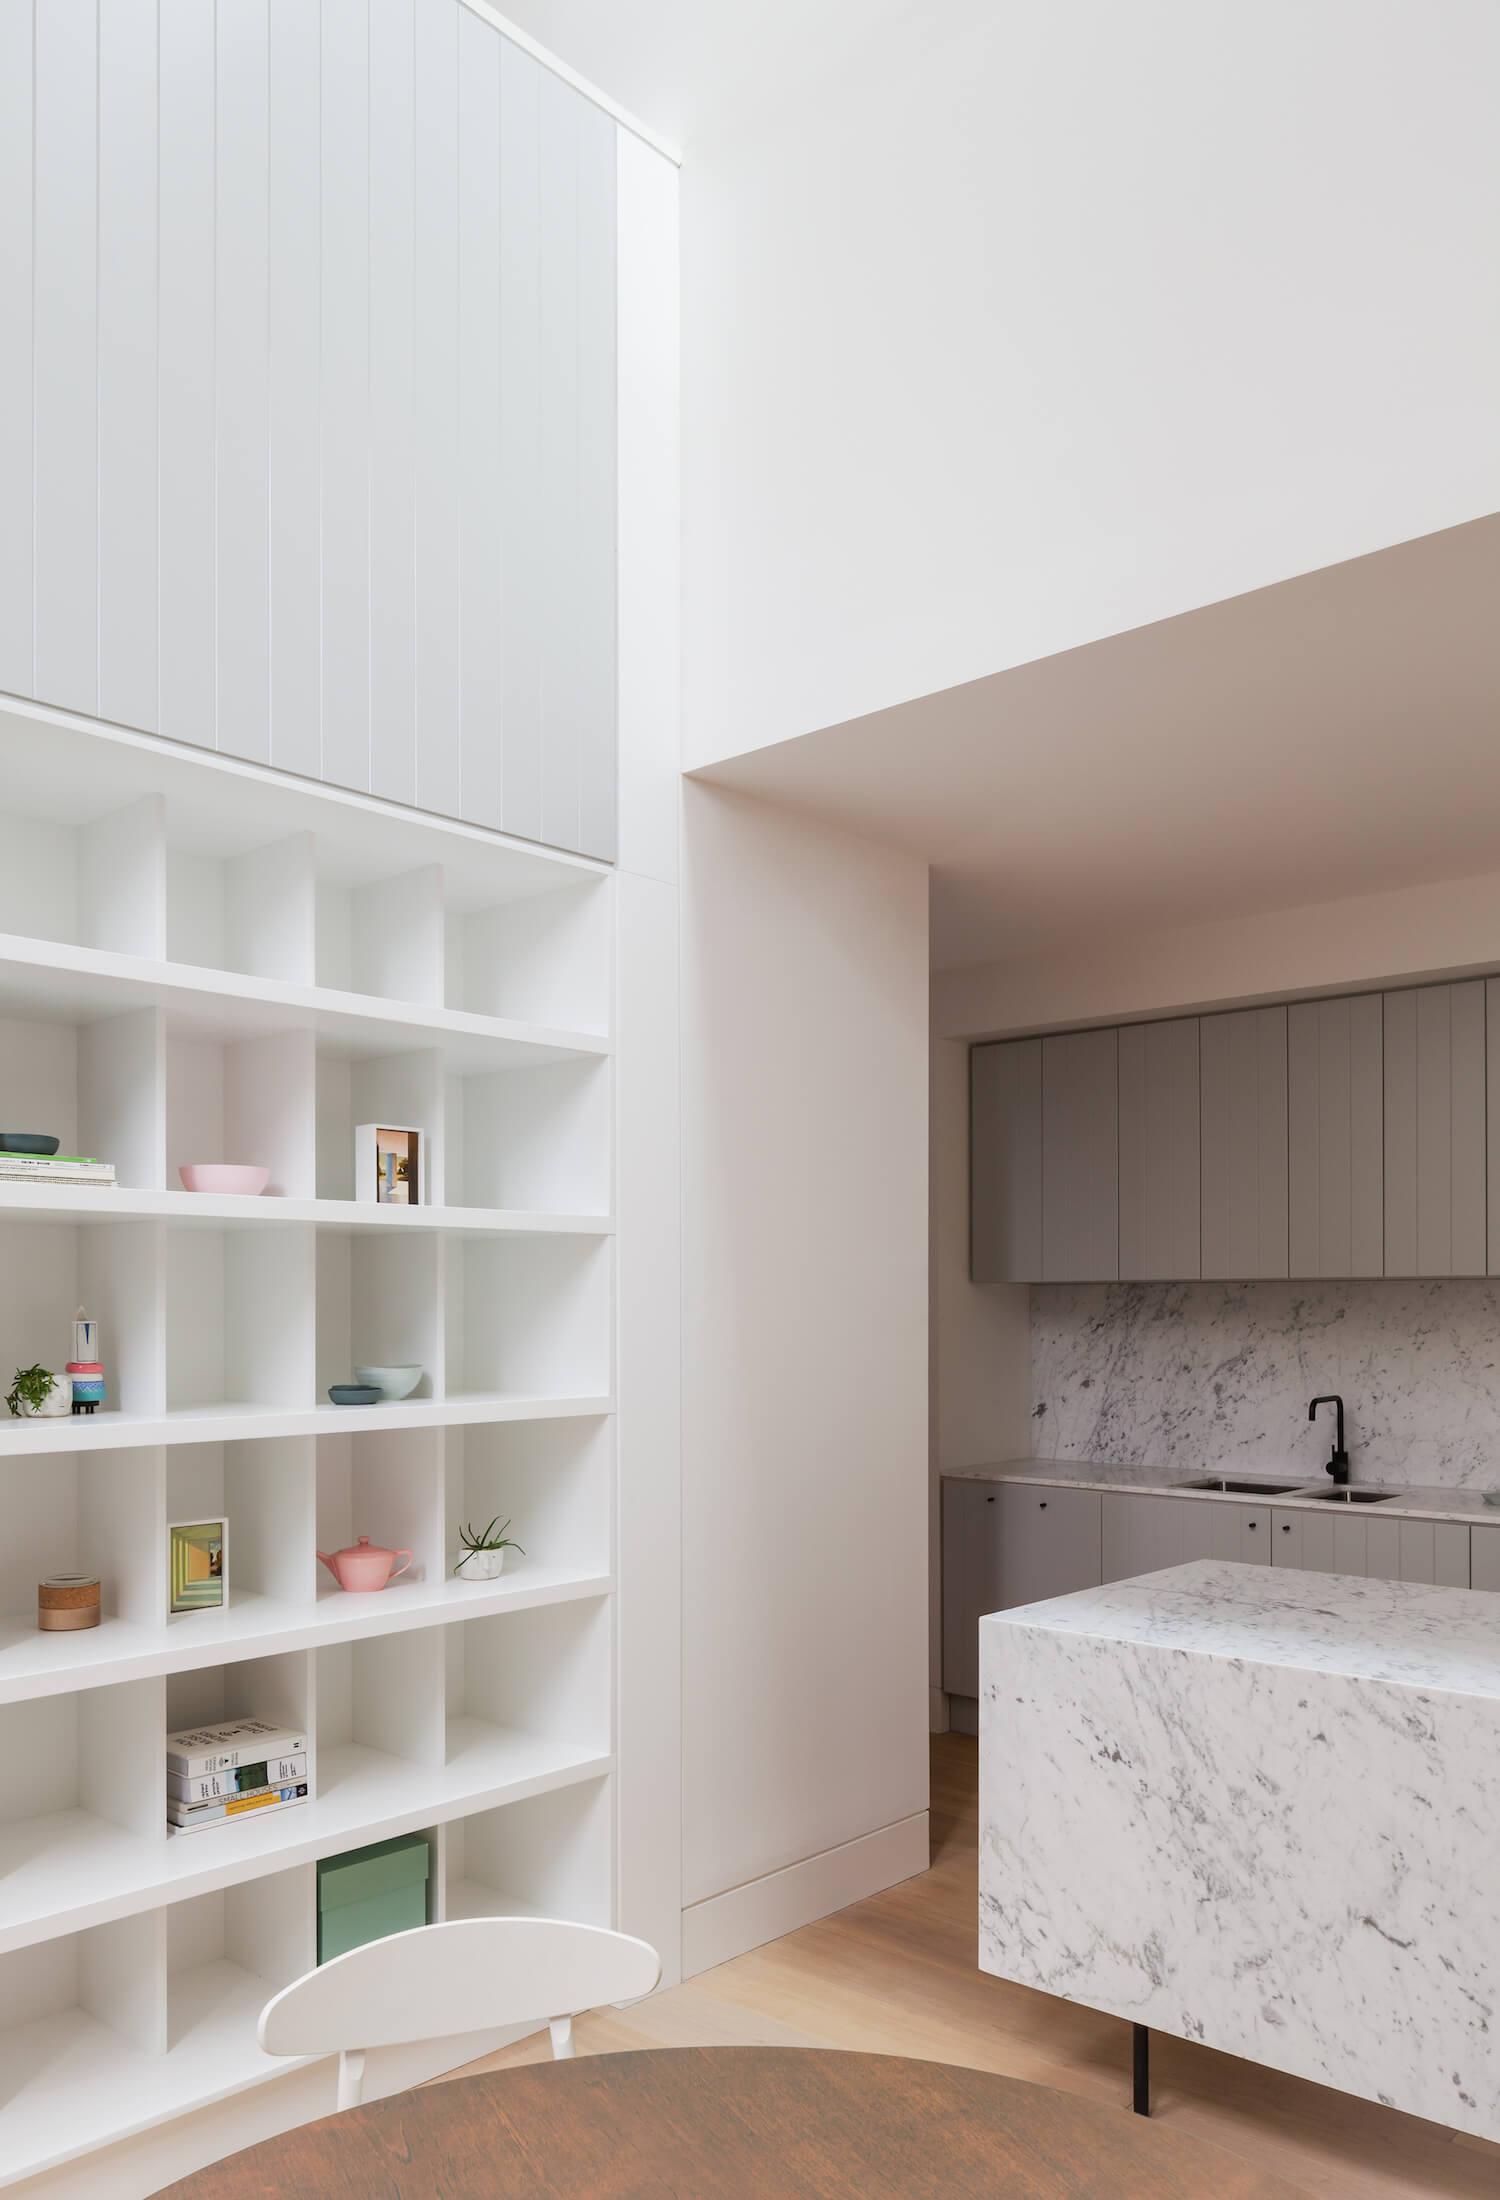 est living interiors simple geometry 3